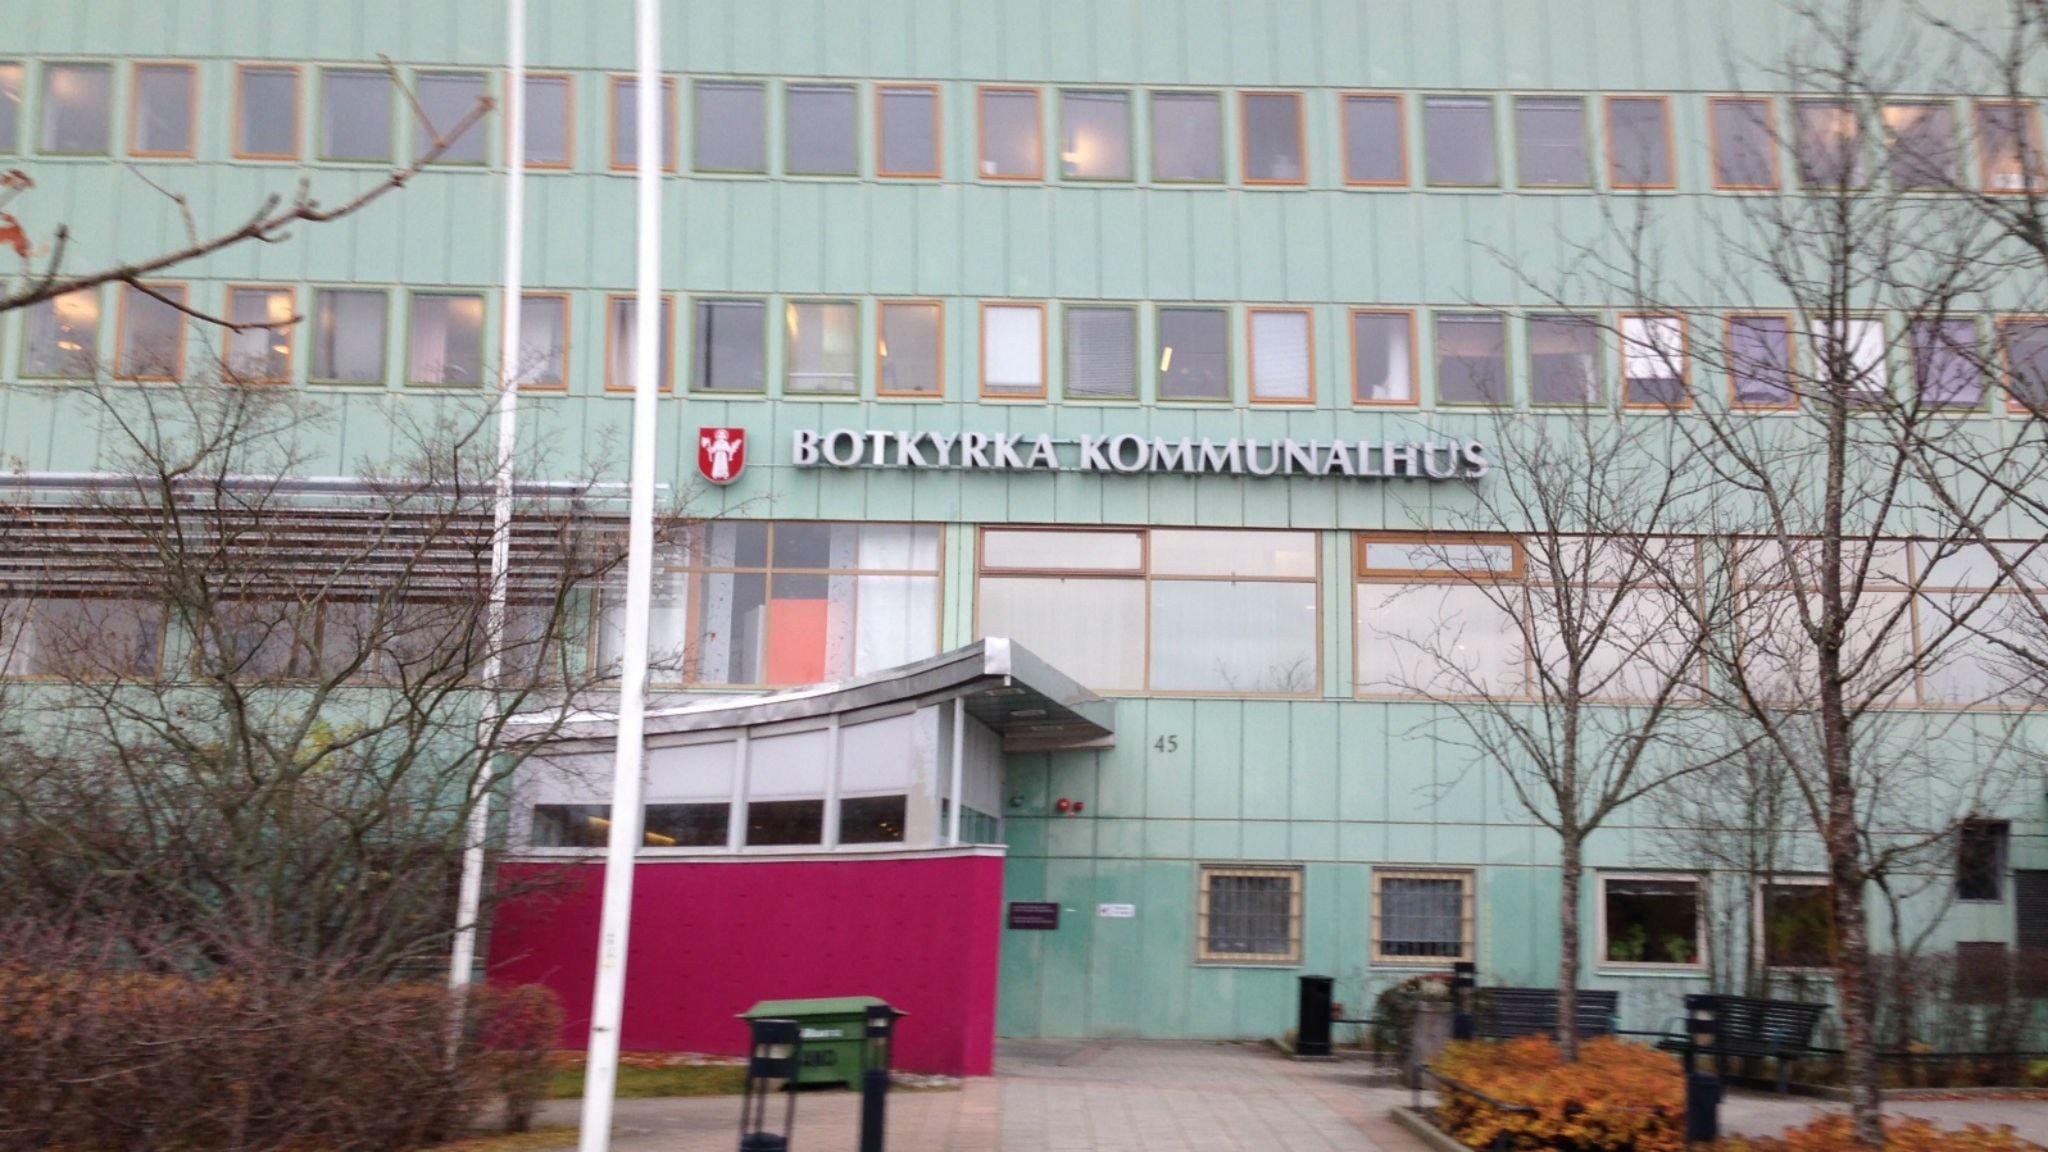 diskret fusk avsugning i Stockholm